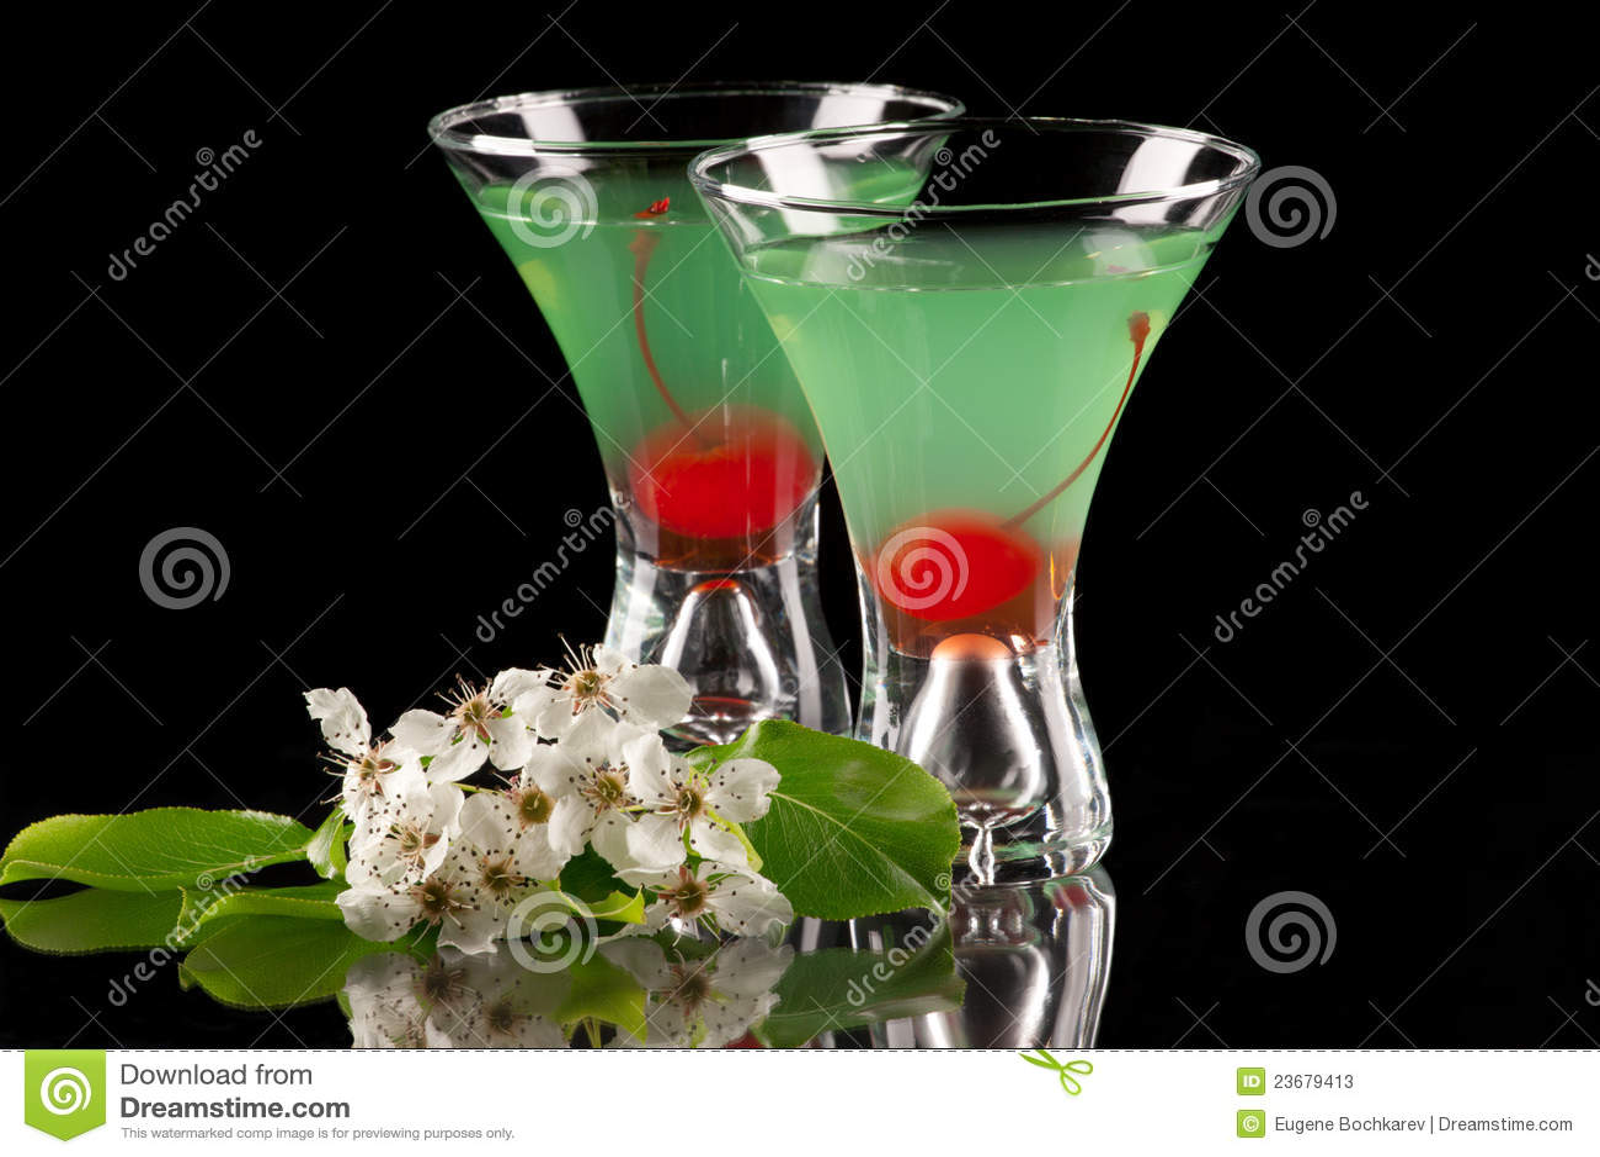 Appletini - Most popular cocktails series